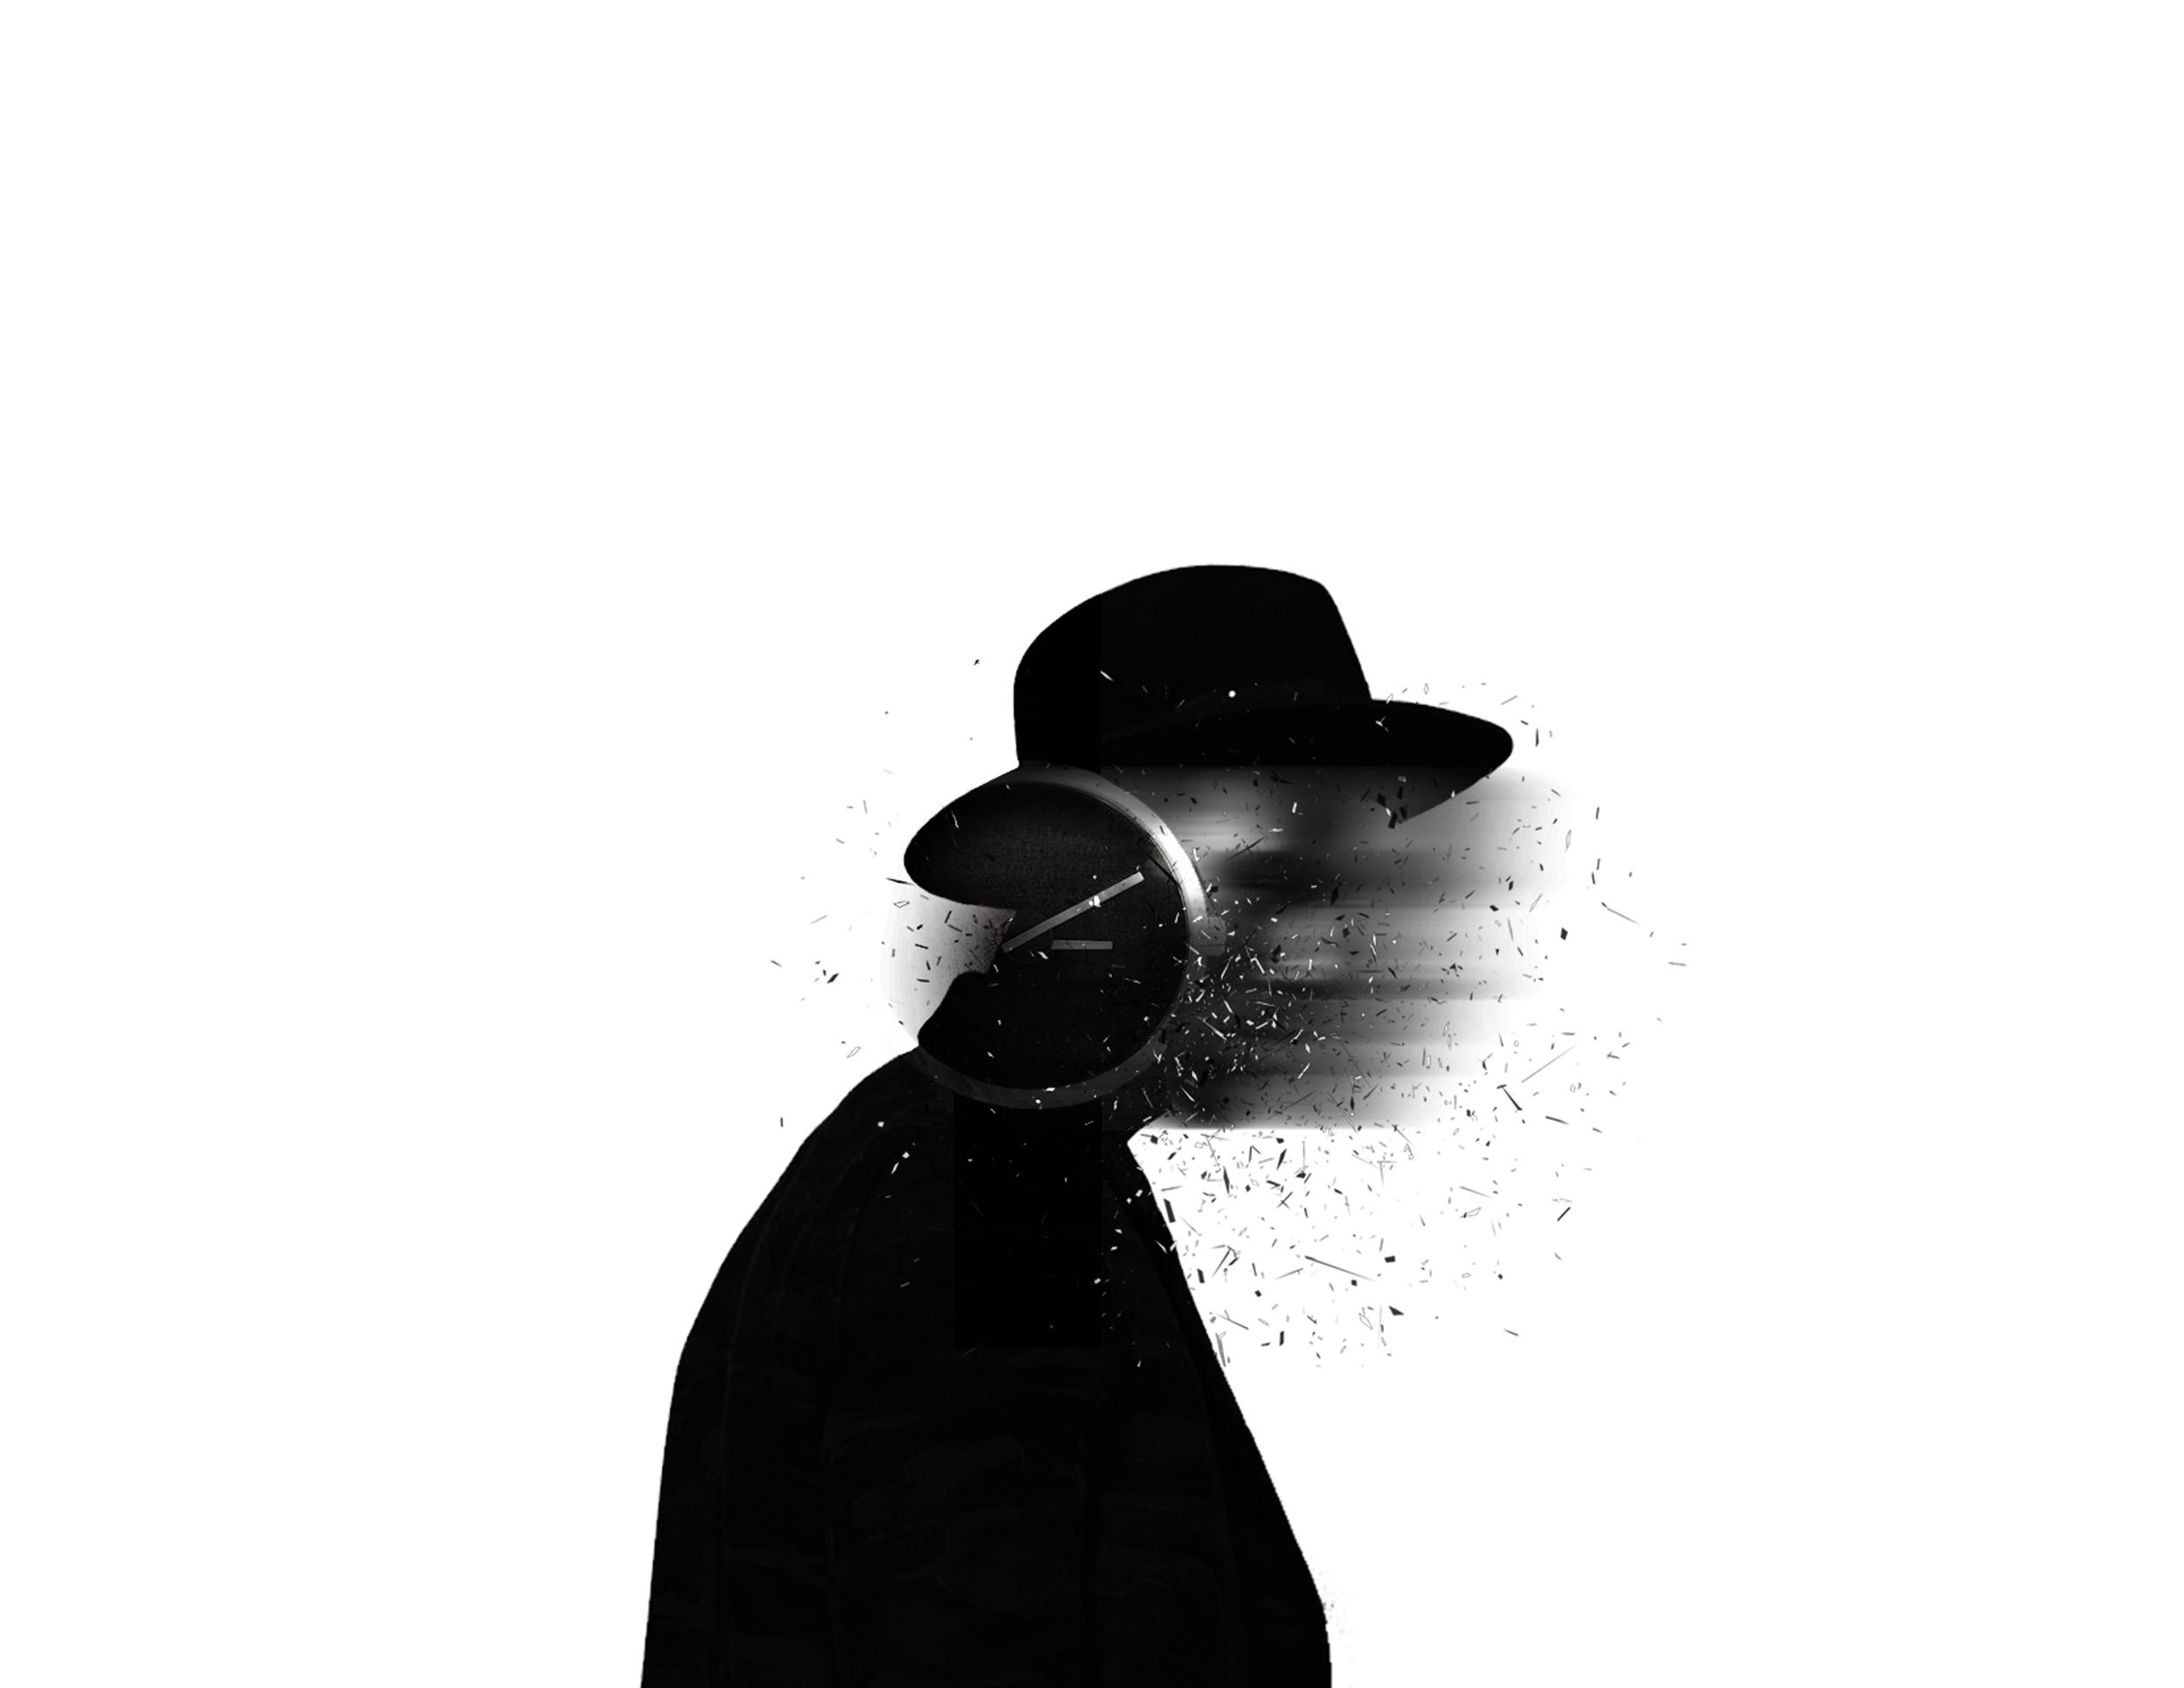 Jeff-Manning-Dapper-Lou-Interview-2015-Graphic-Artist-Desinger5.jpg